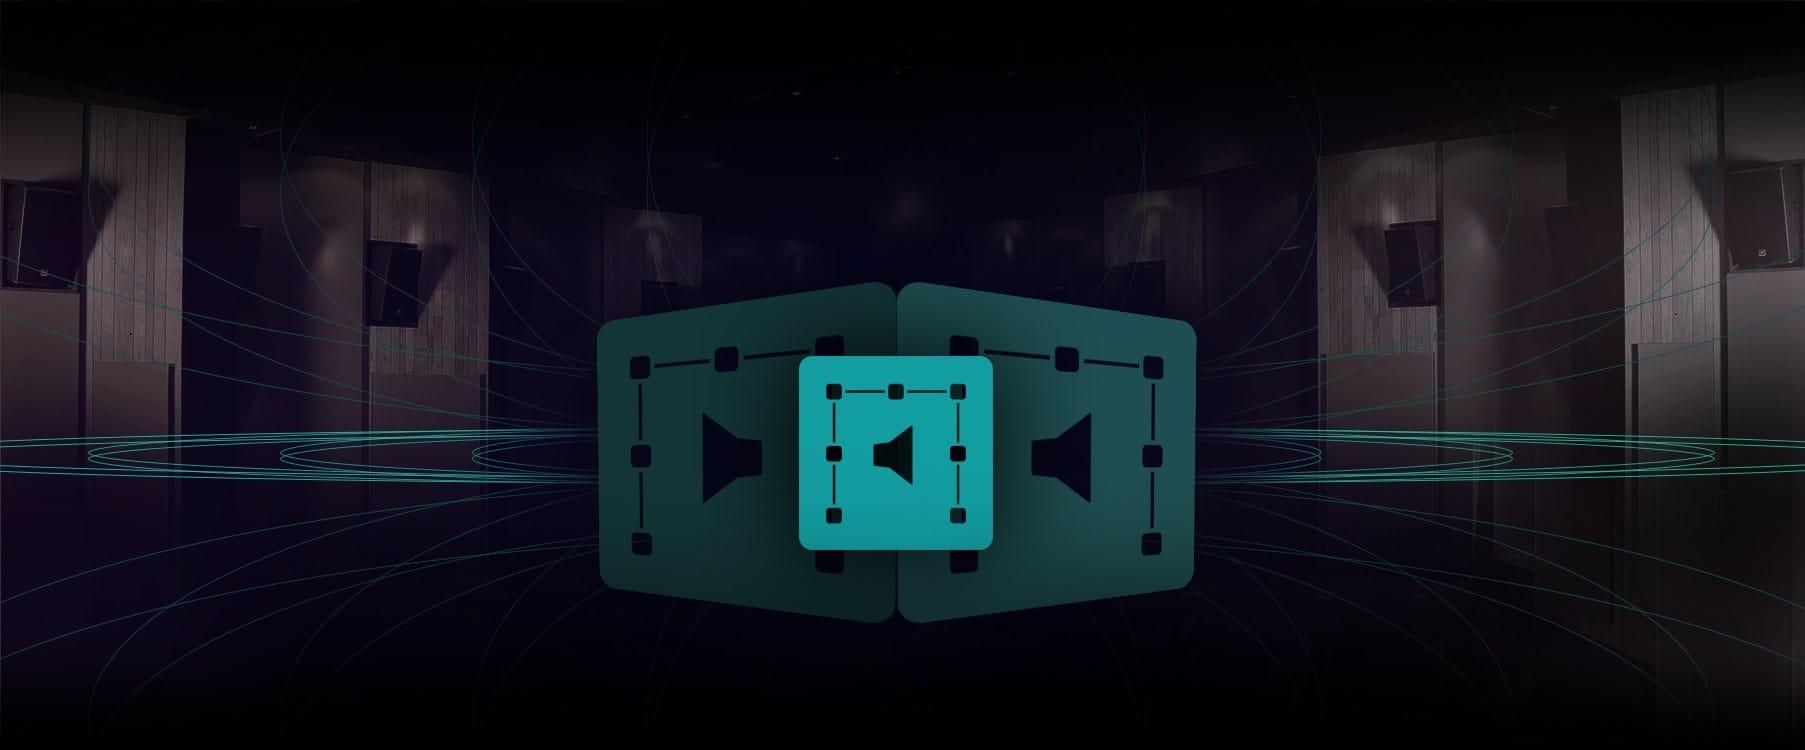 The Basics of Surround Sound - Part1